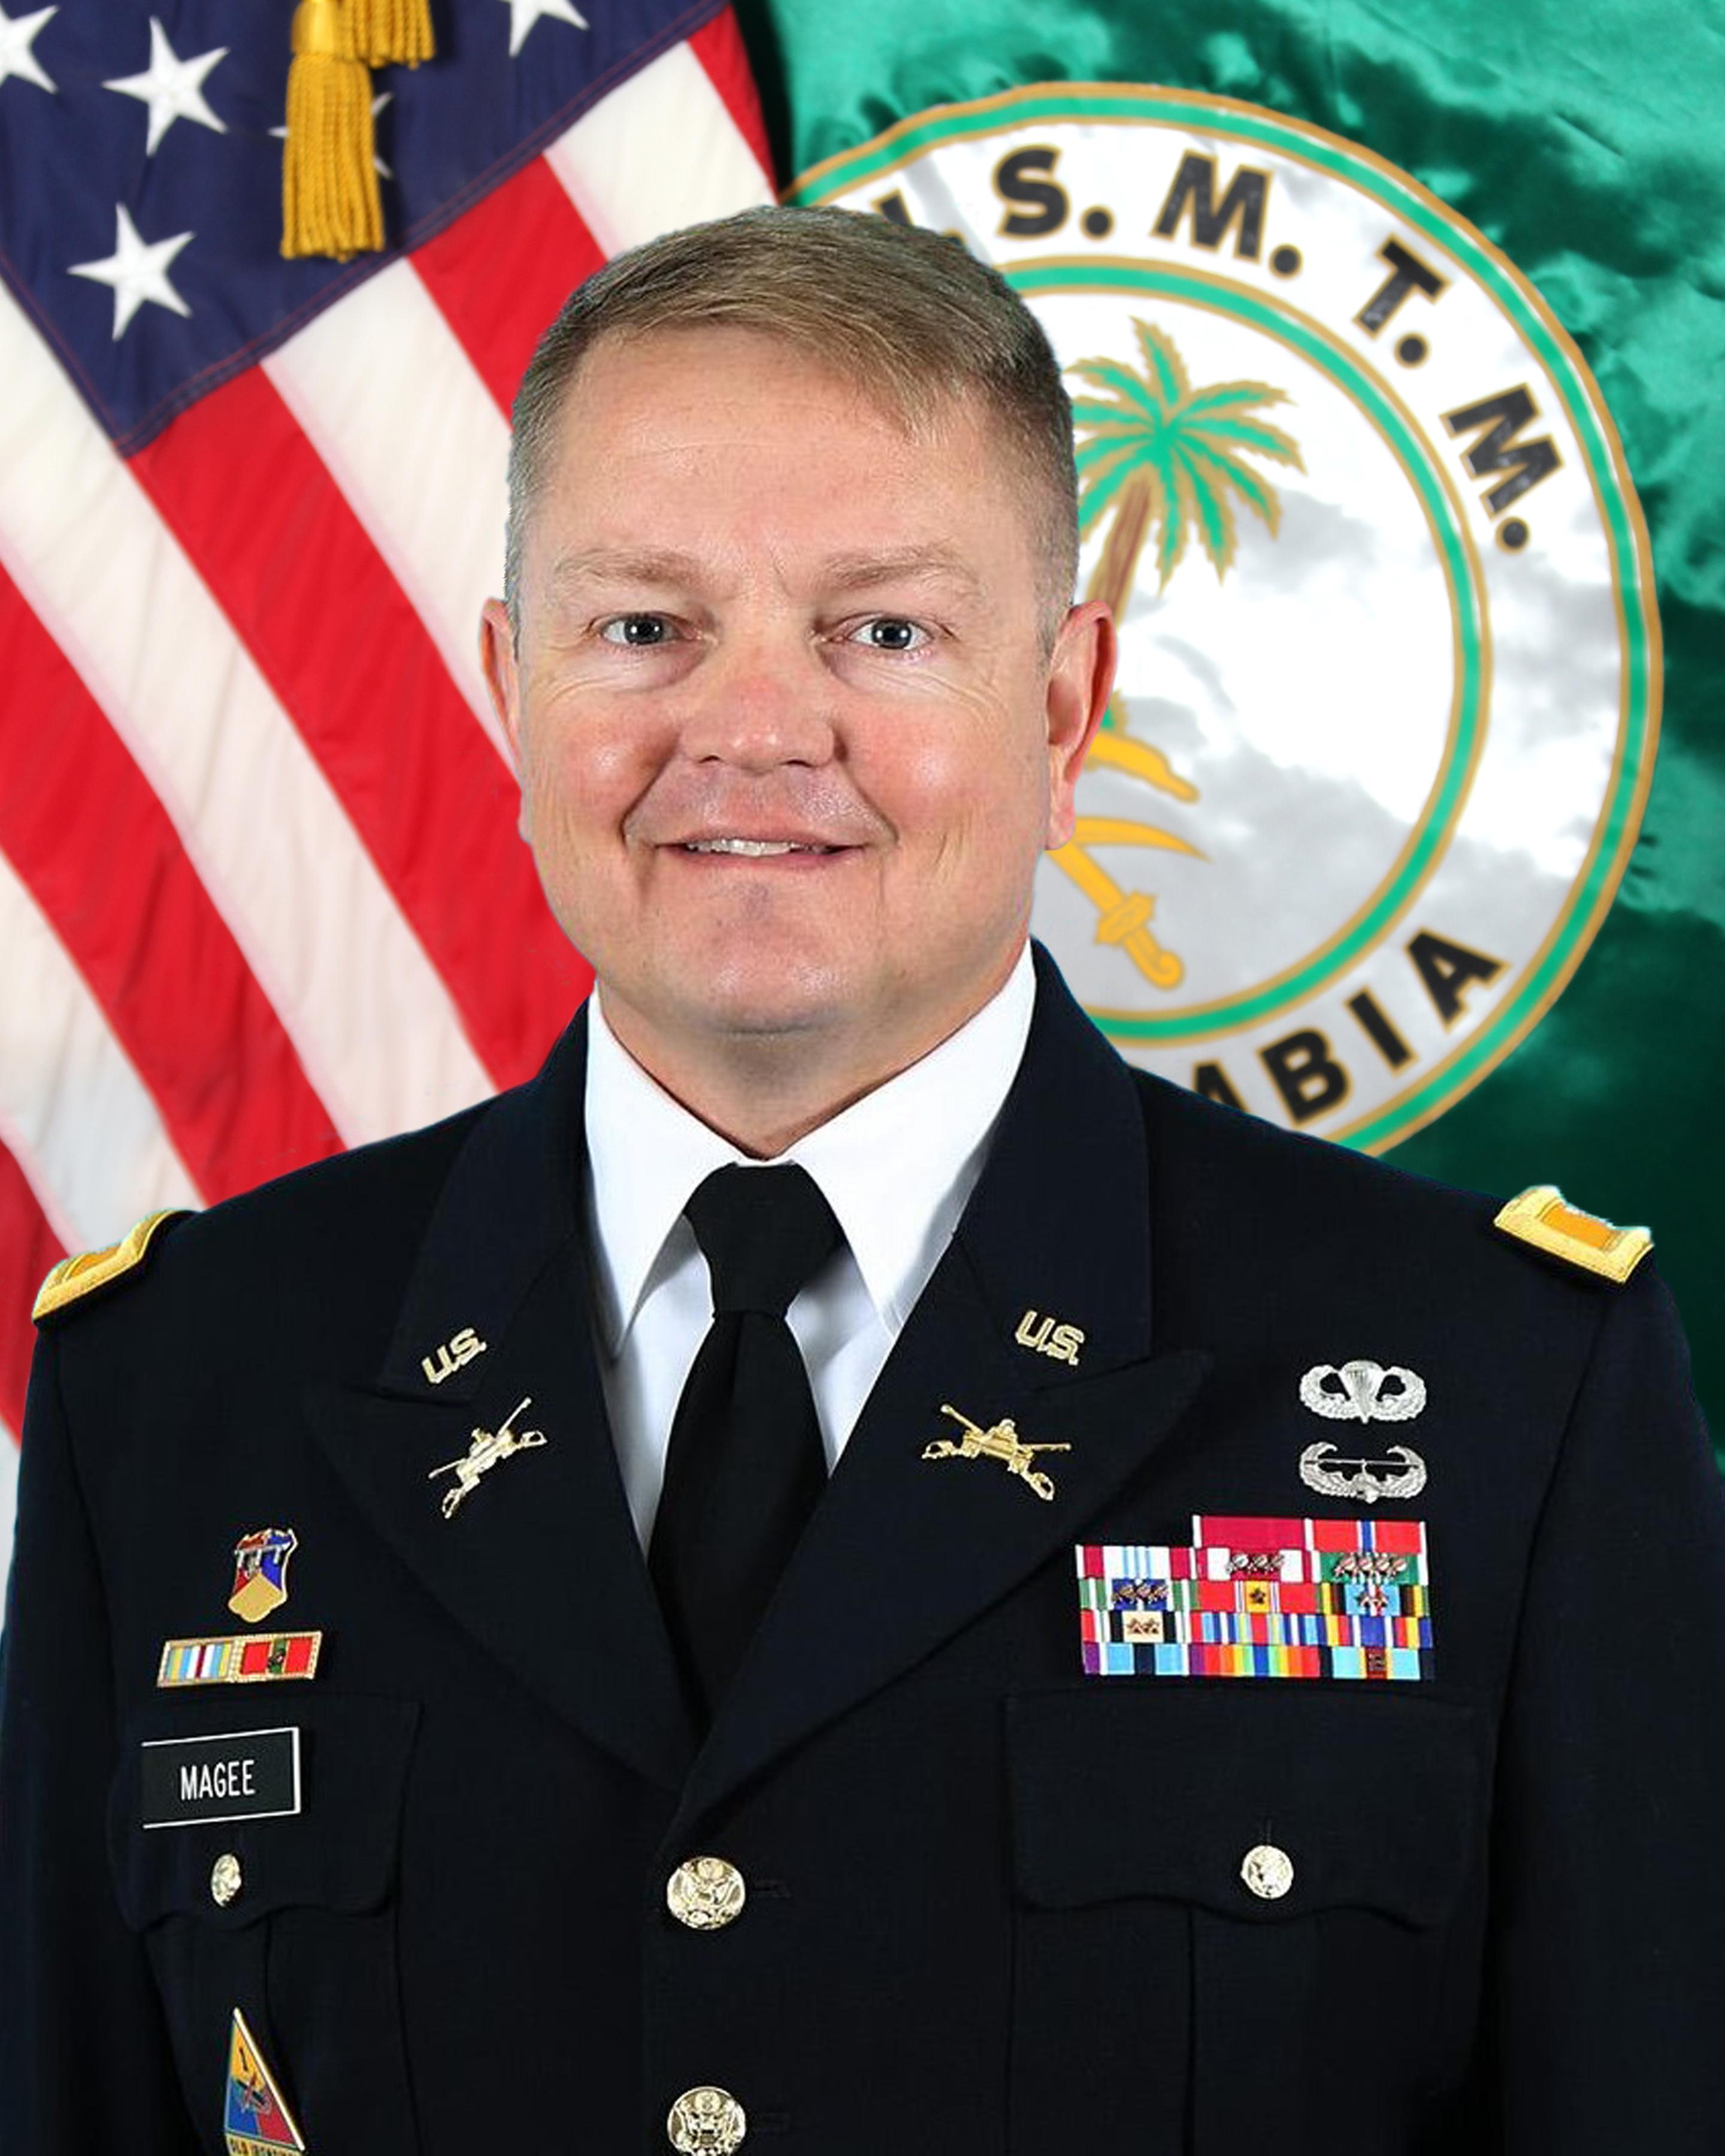 United States Military Training Mission